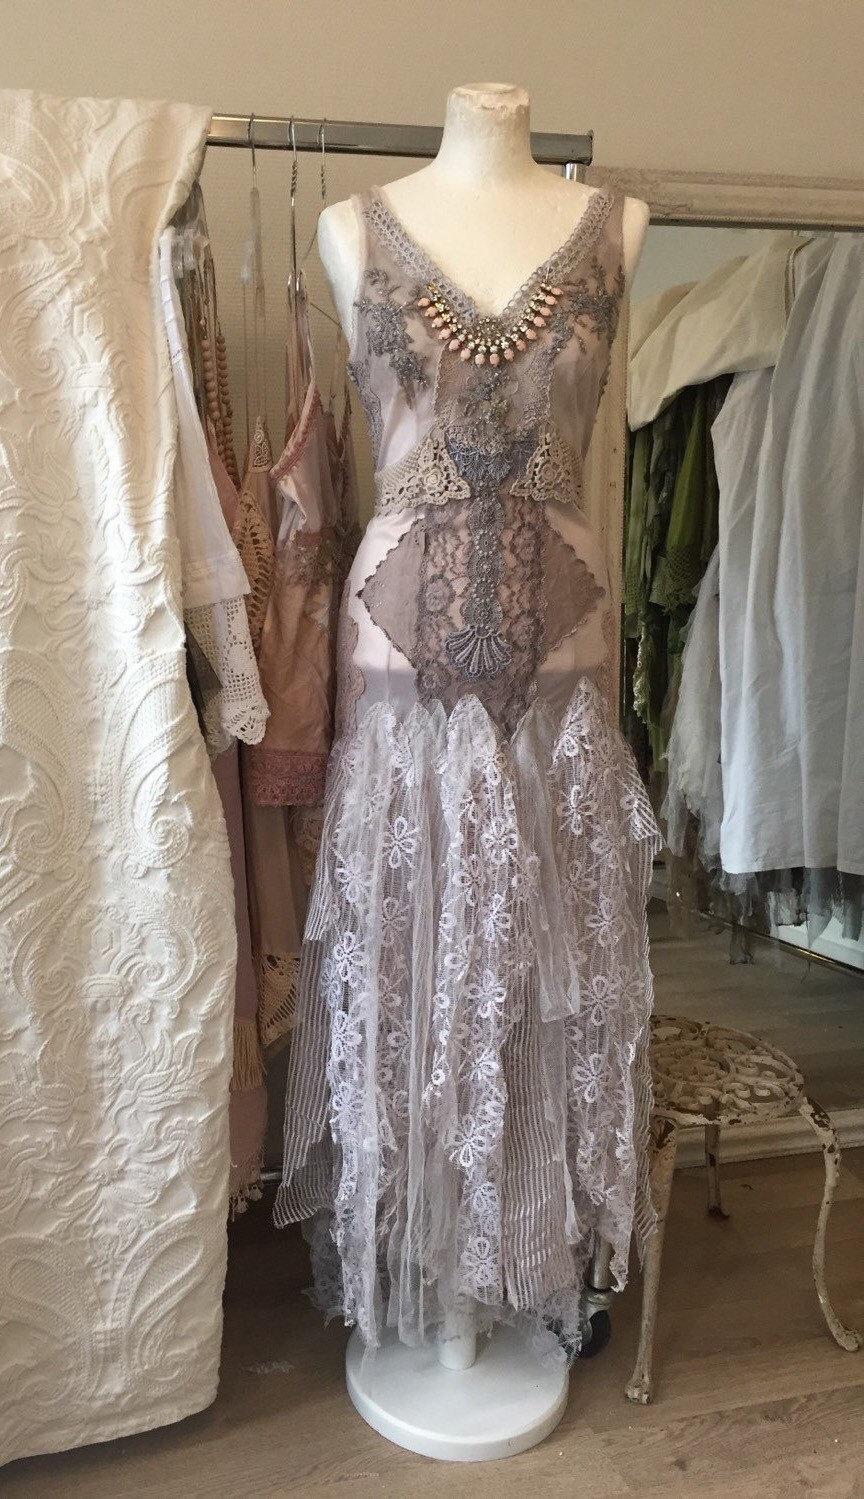 non corset a silhouette lavender wedding dress with a lace bodice lavender wedding dress MG MG MG MG MG MG MG